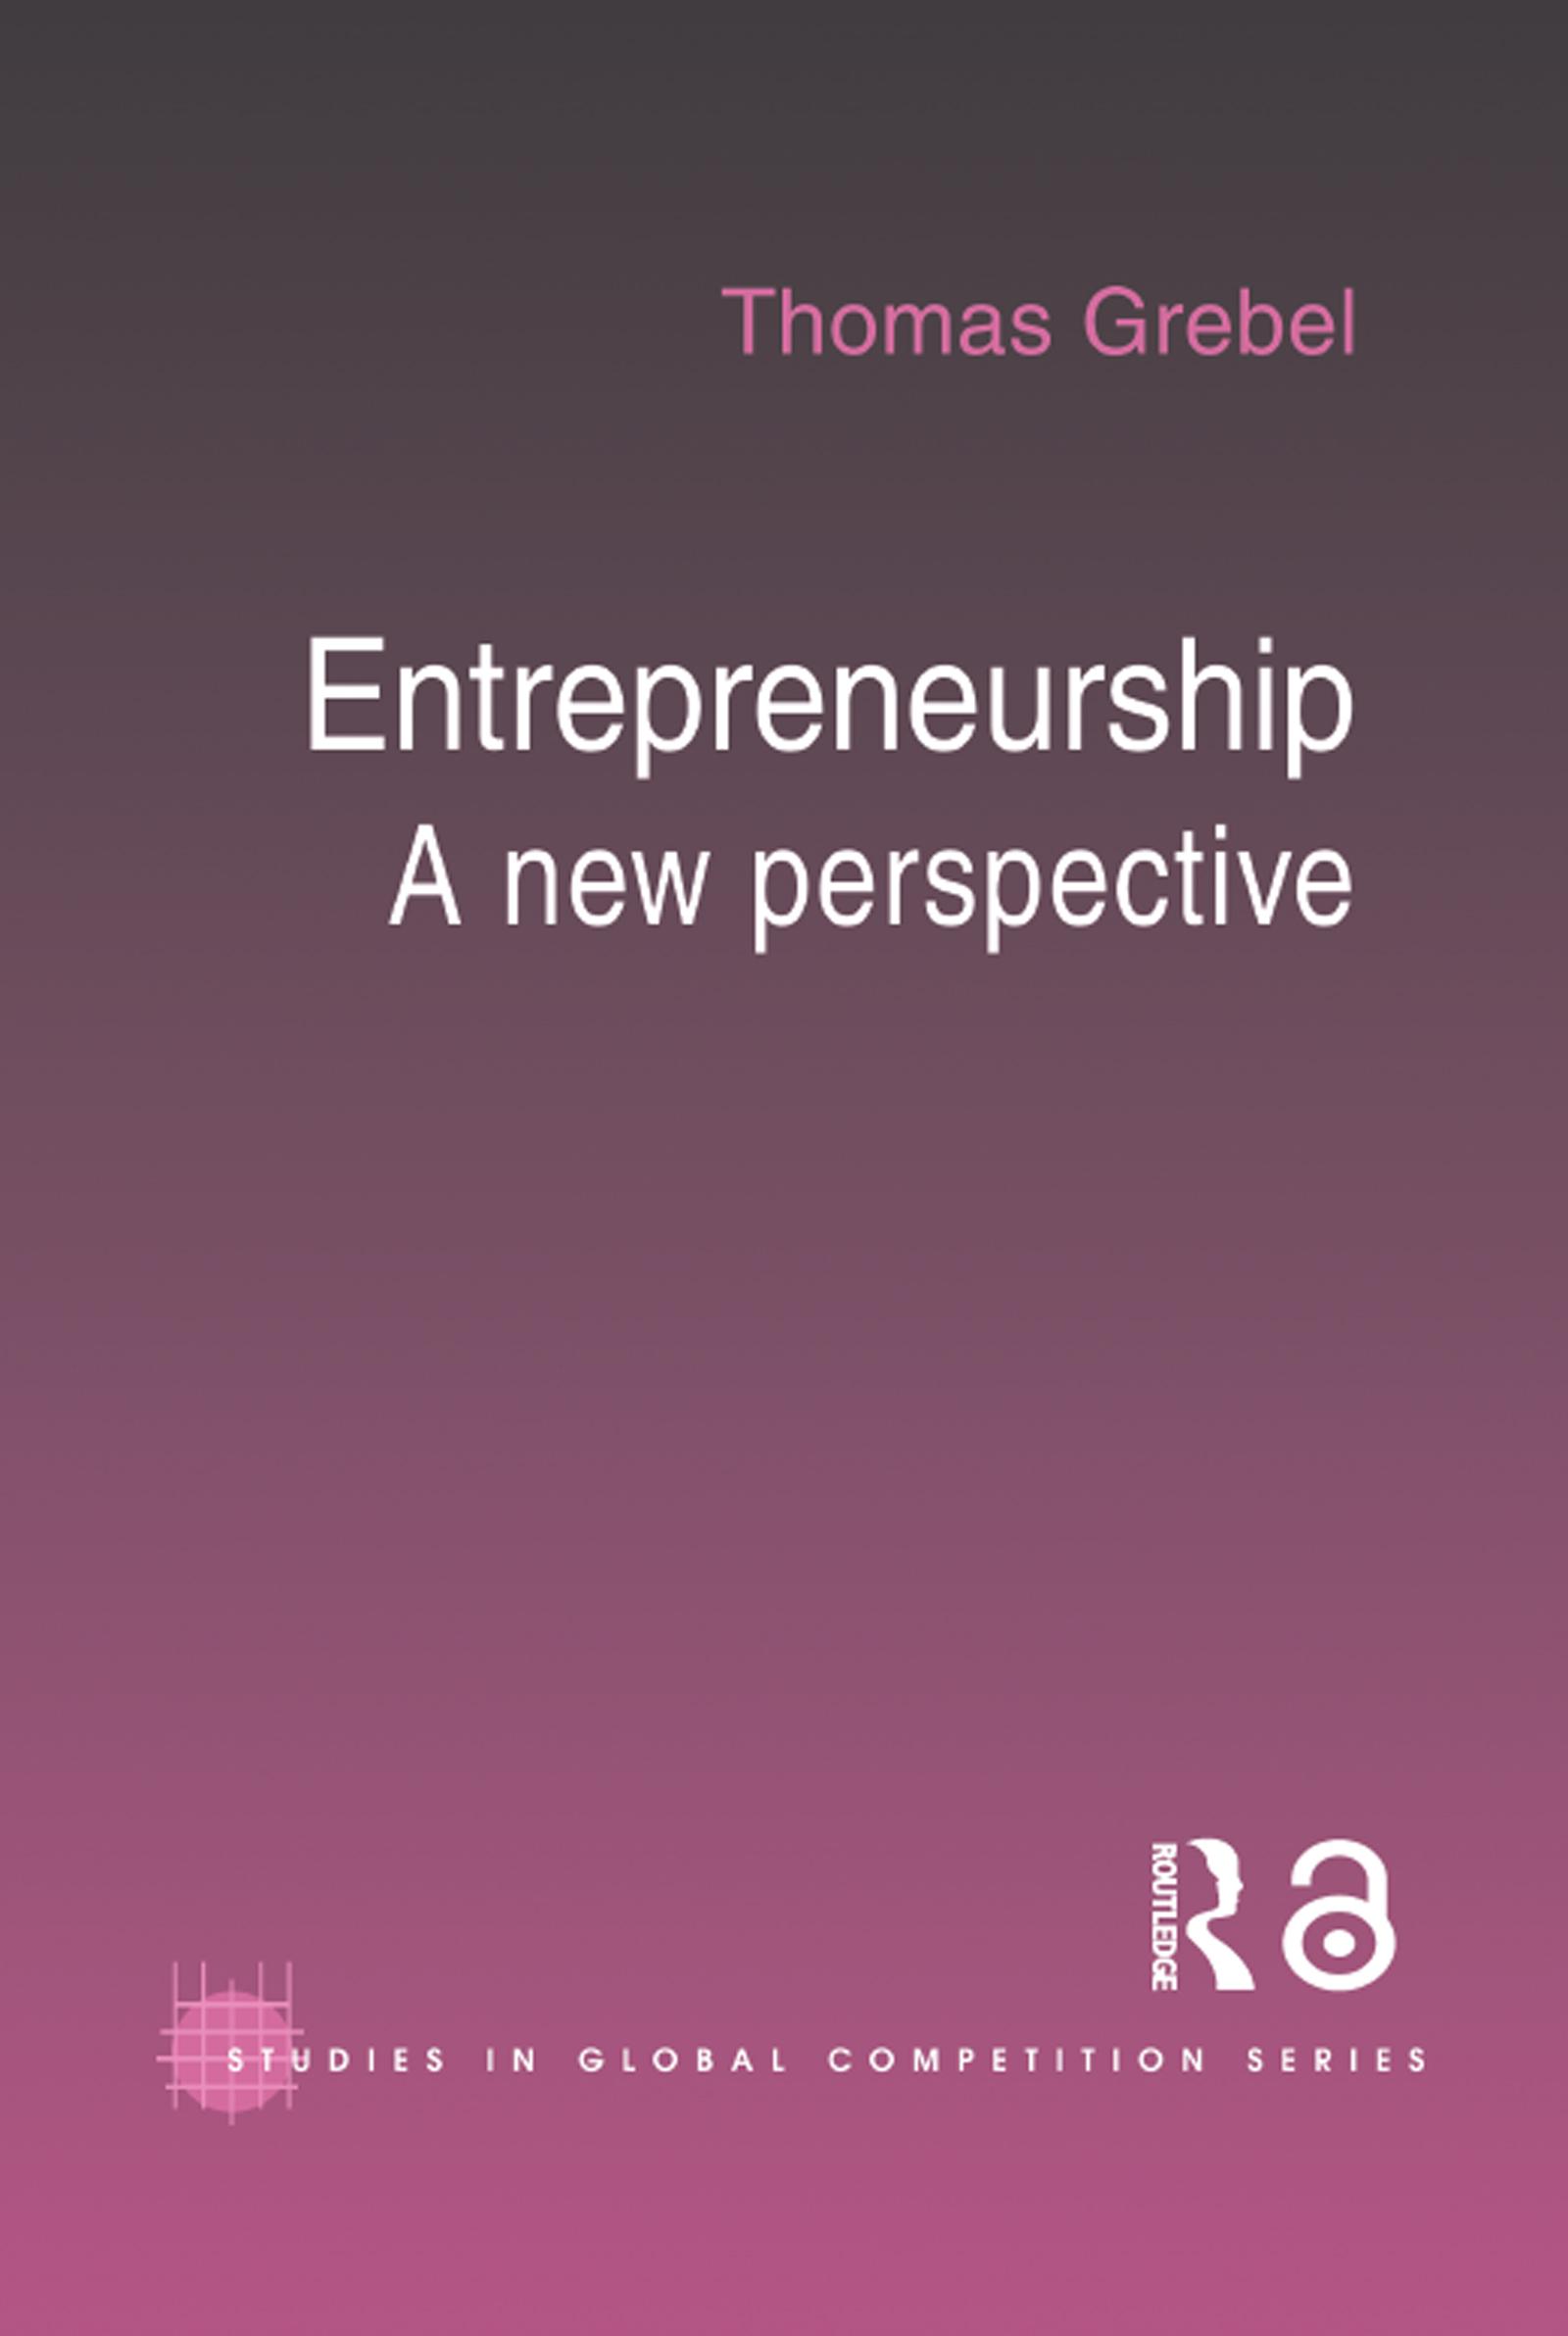 Download Ebook Entrepreneurship by Thomas Grebel Pdf